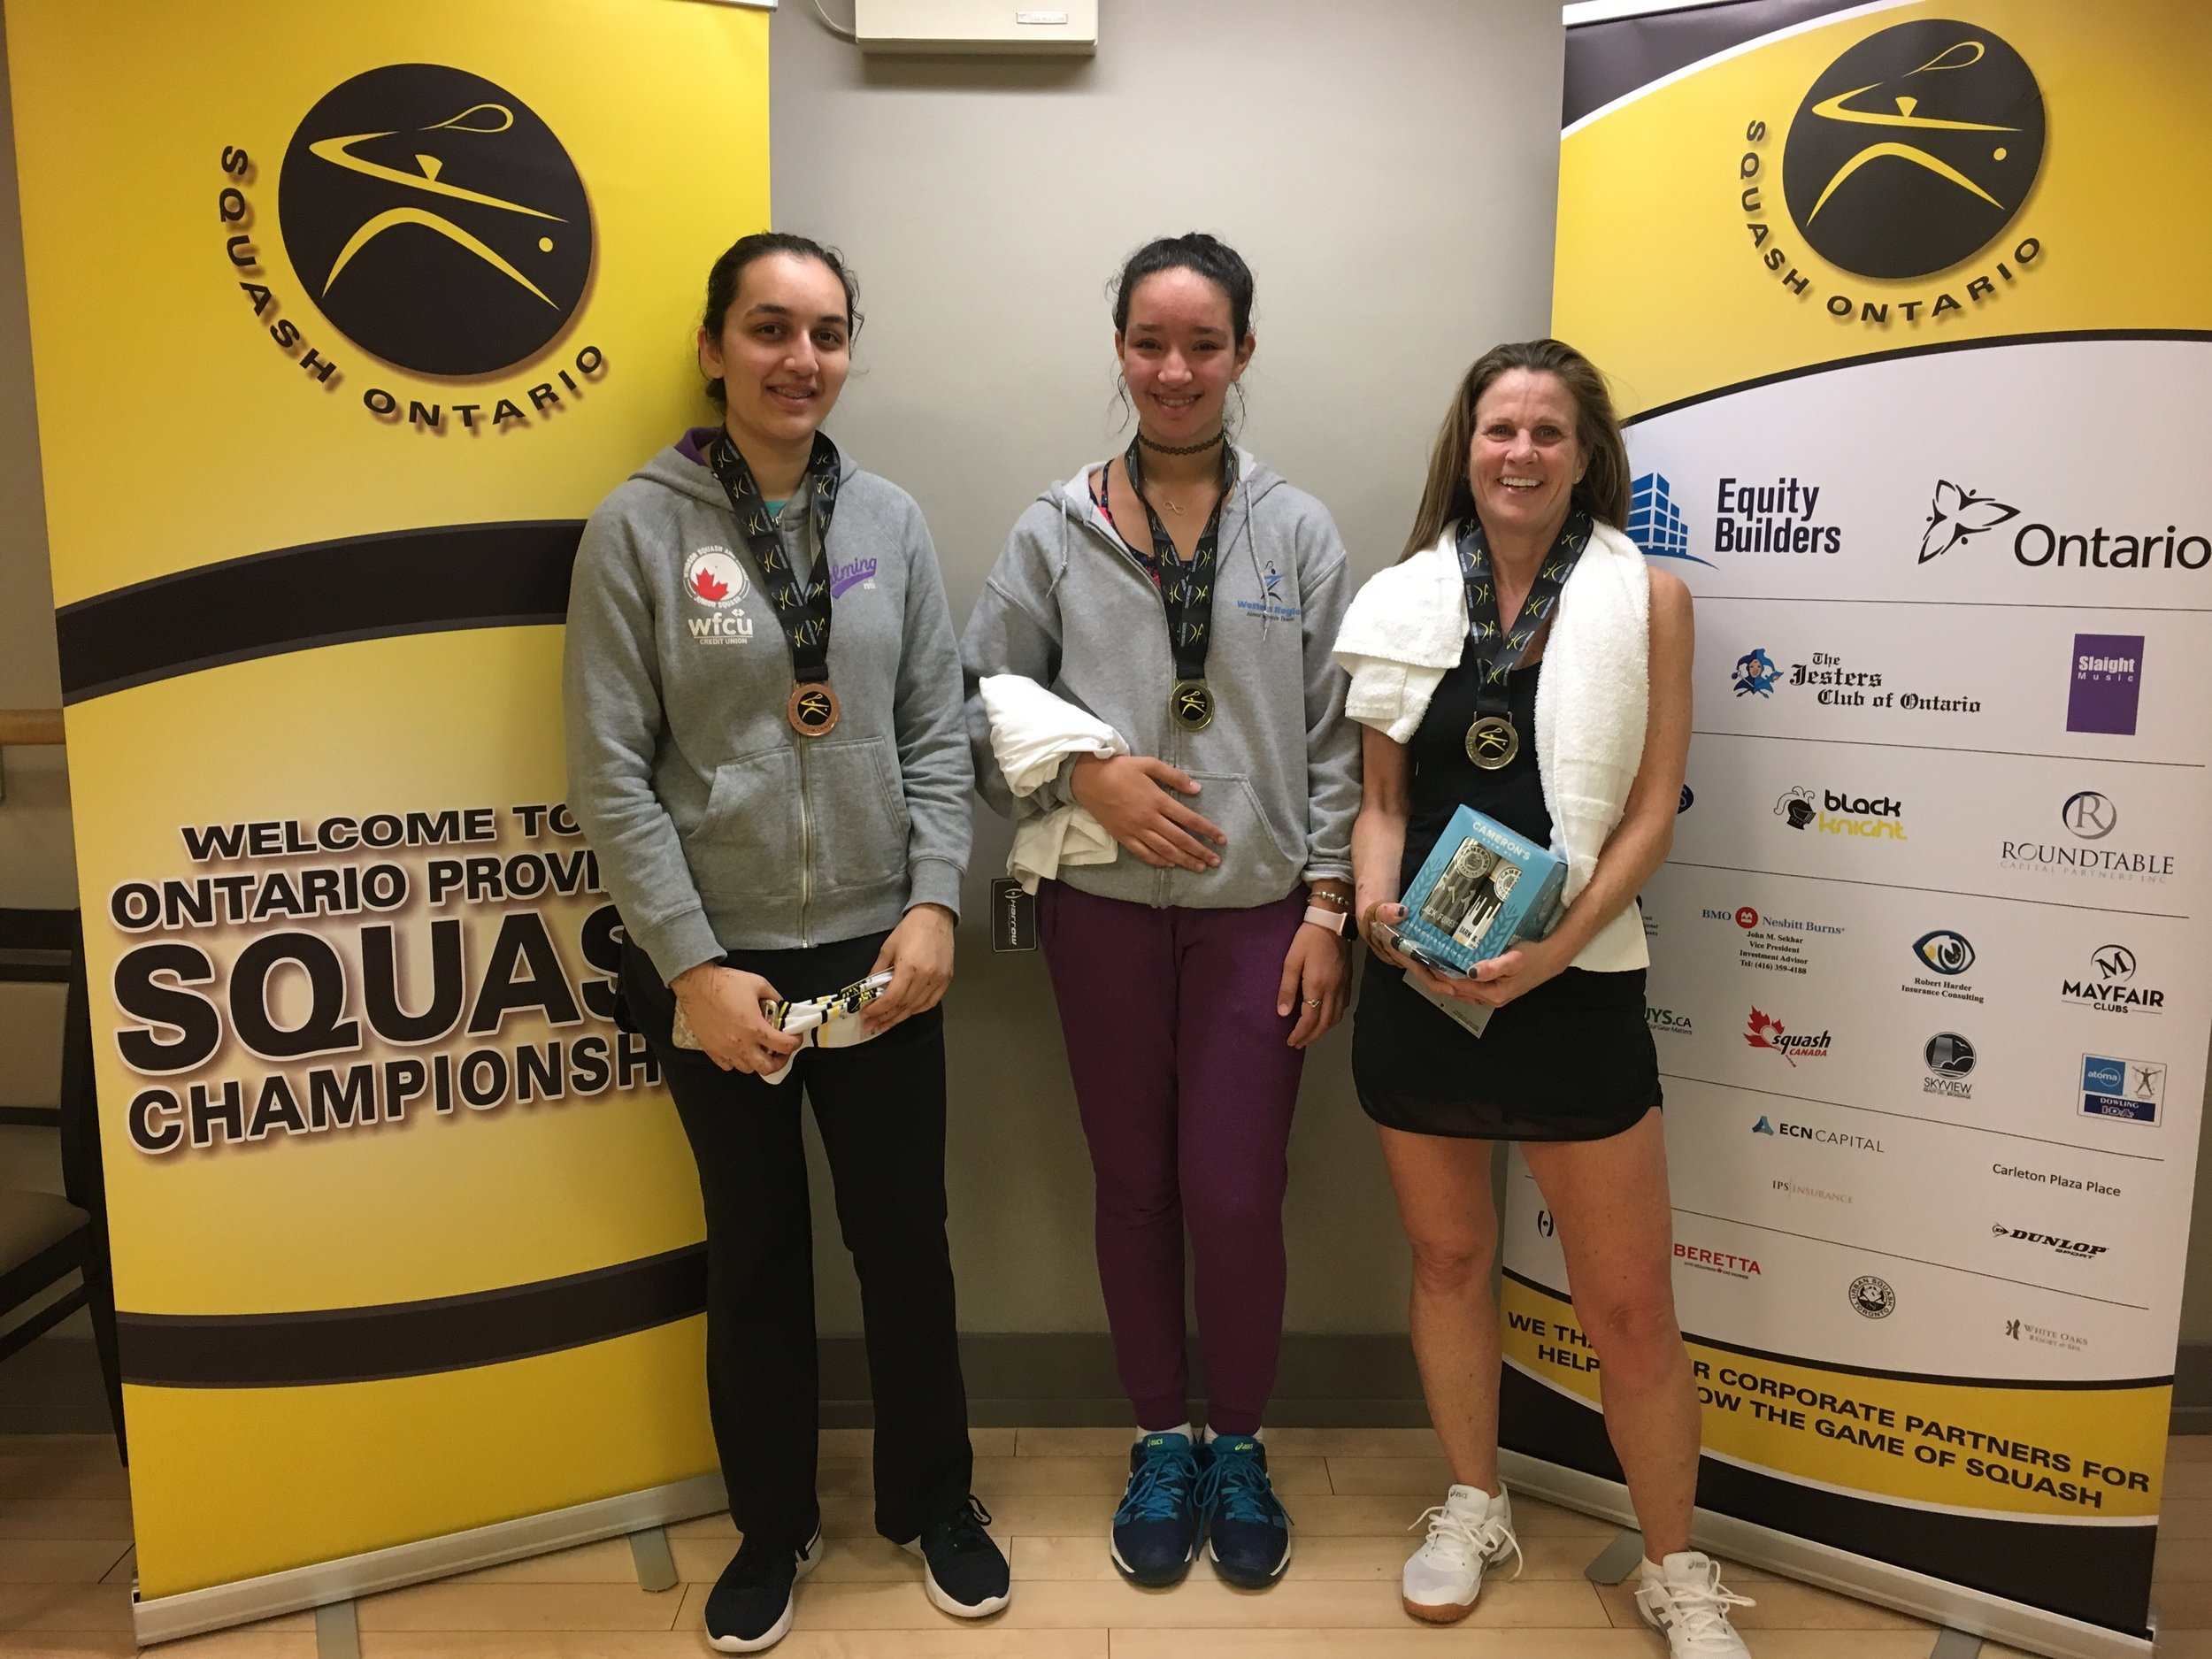 L-R: Sara Khan, Salma Mounir, Julie Hisey